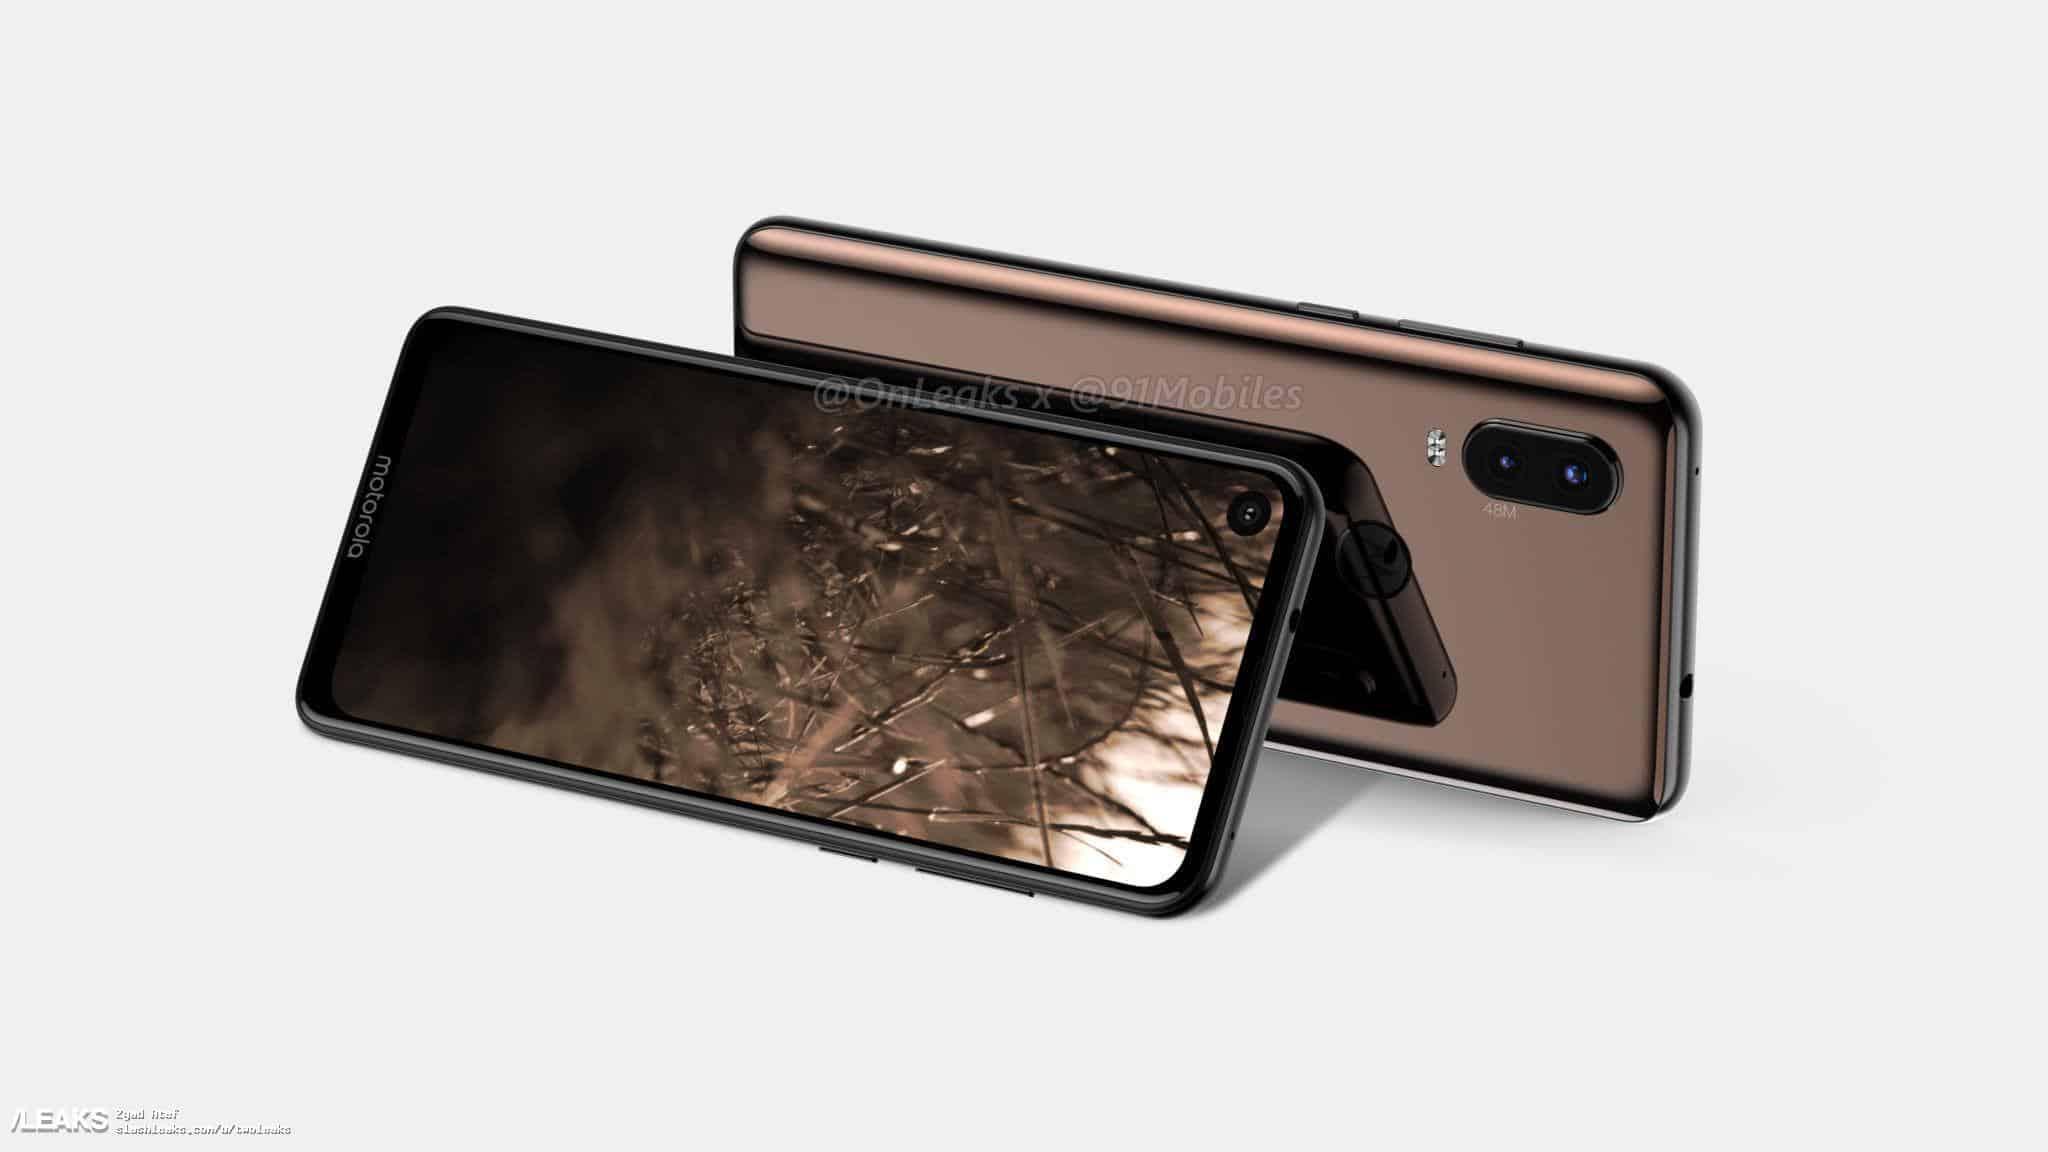 Motorola p40 360° video render reveals will ditch notch for in-display digital camera